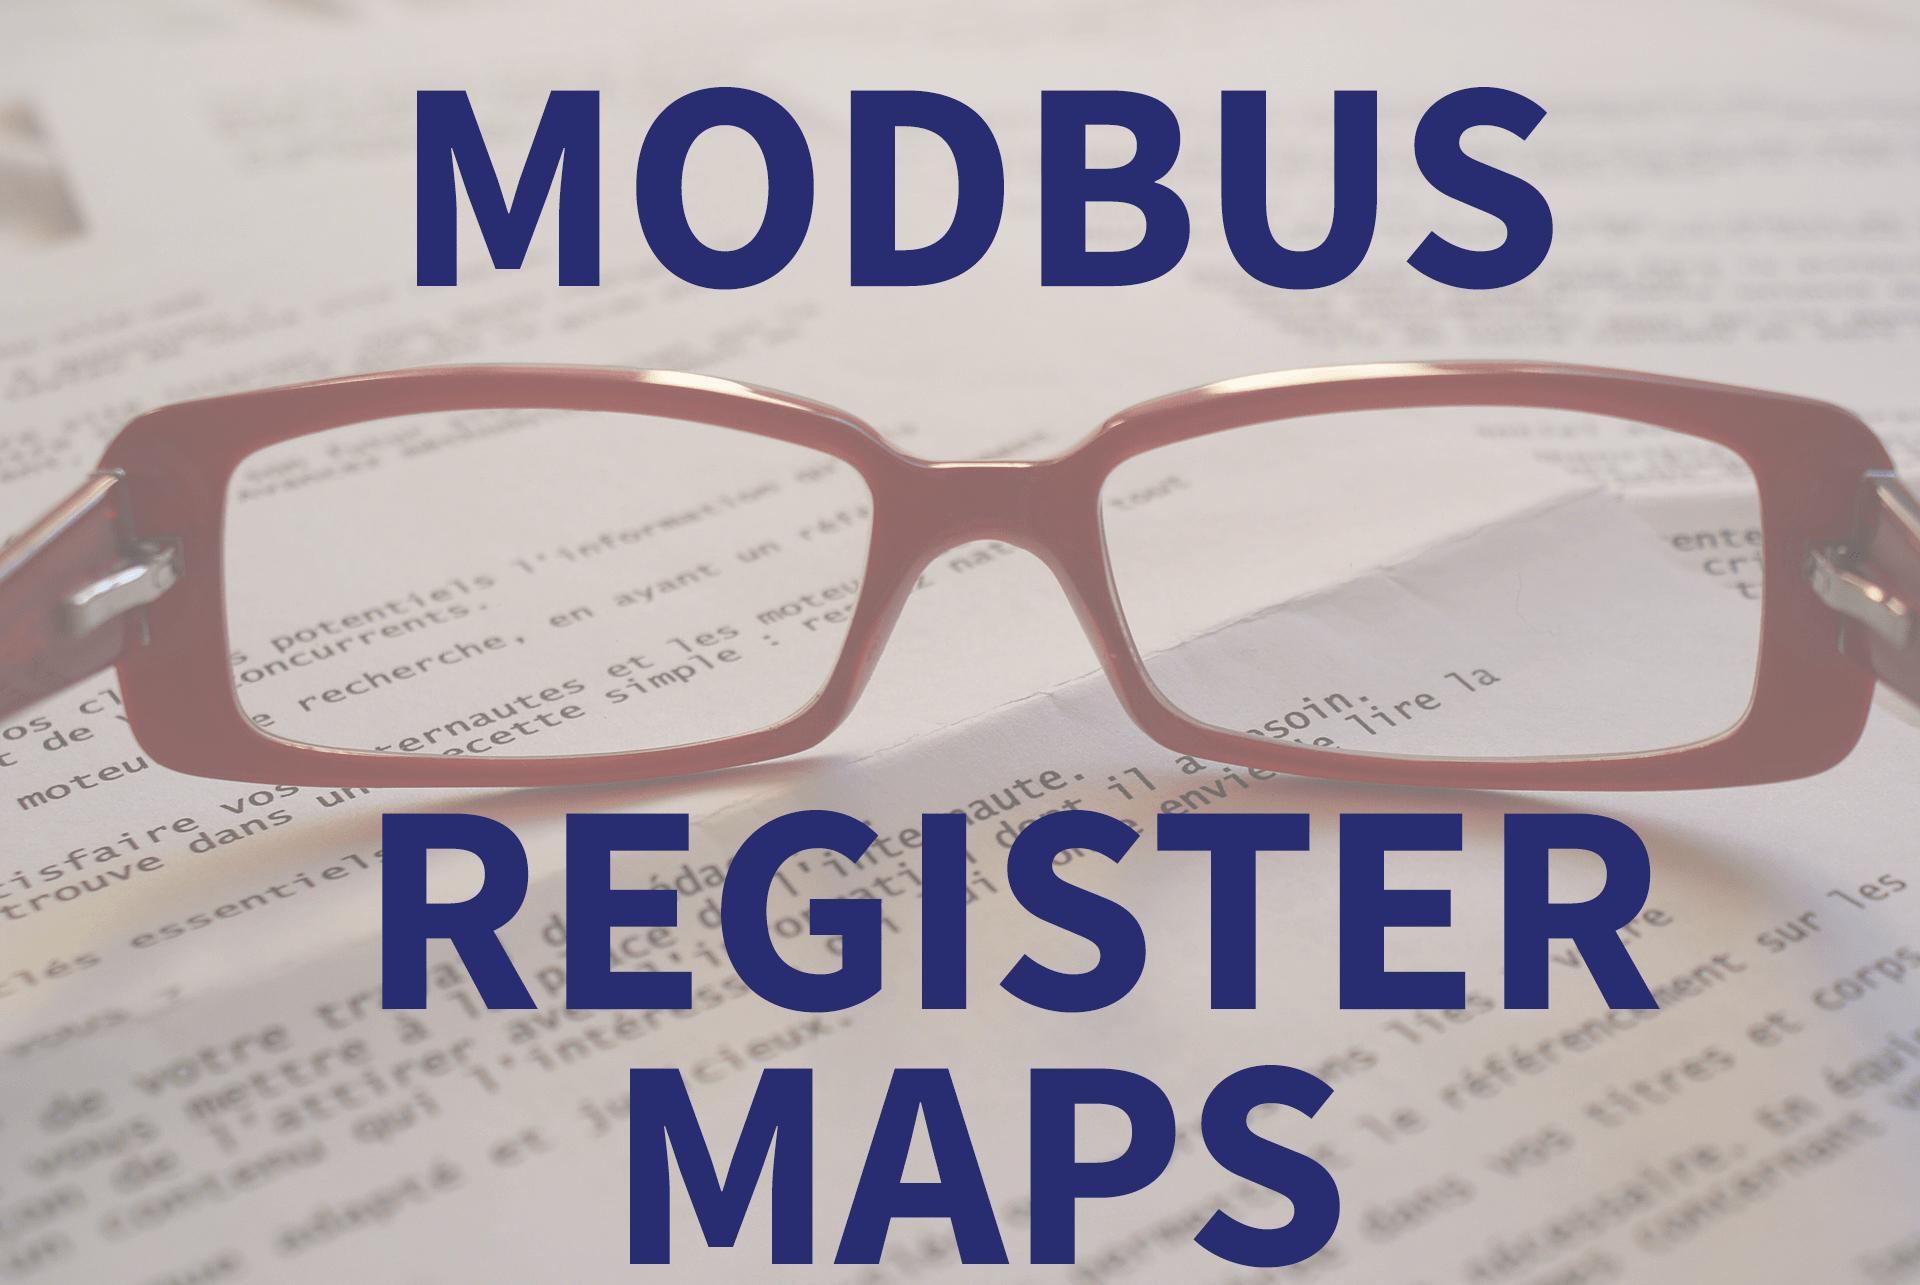 modbus register maps